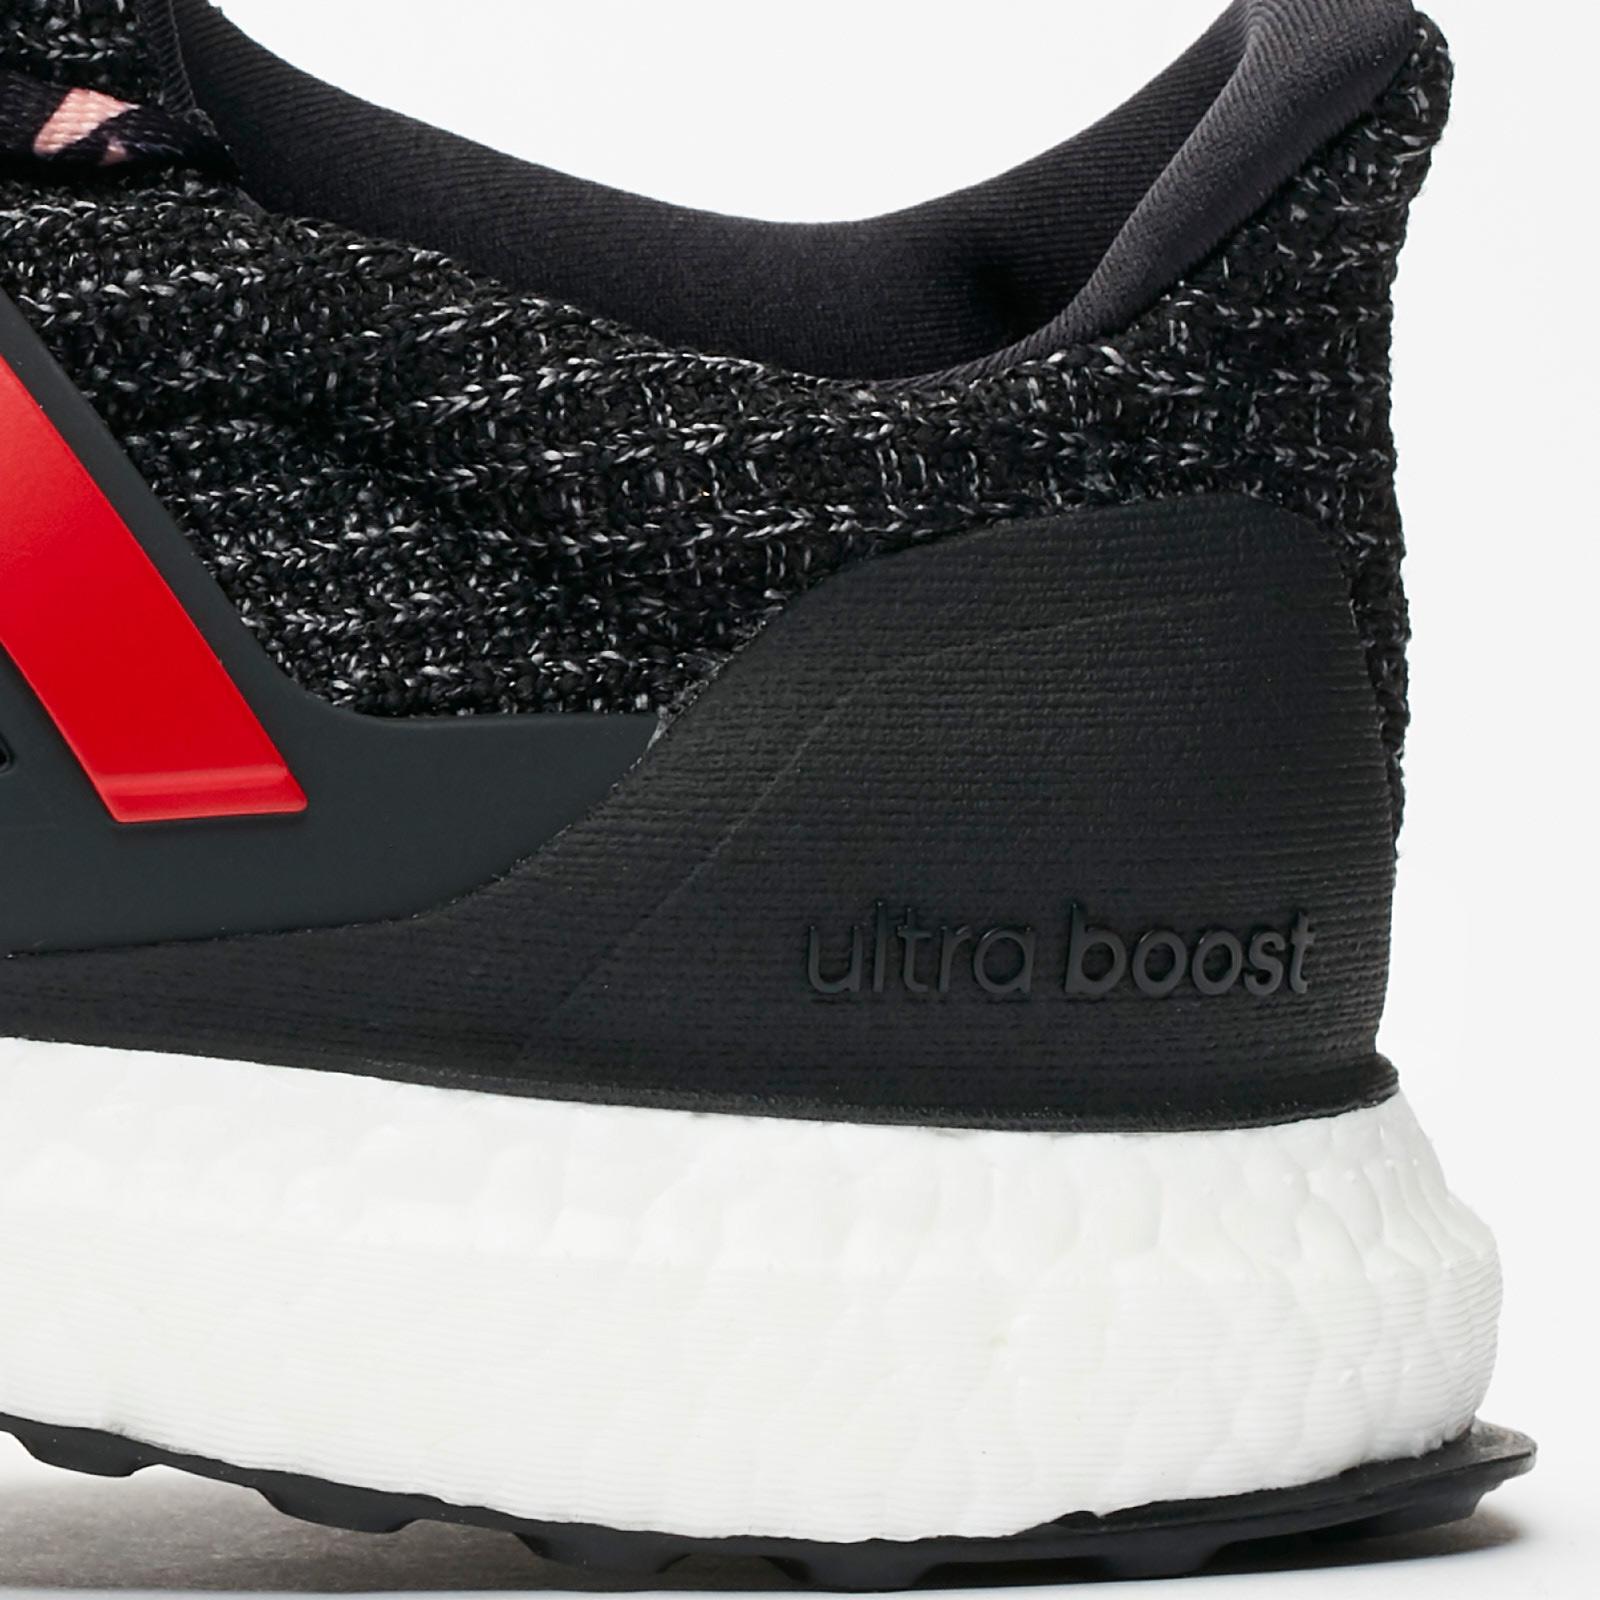 d1c4095b9ec adidas Ultraboost - F35231 - Sneakersnstuff